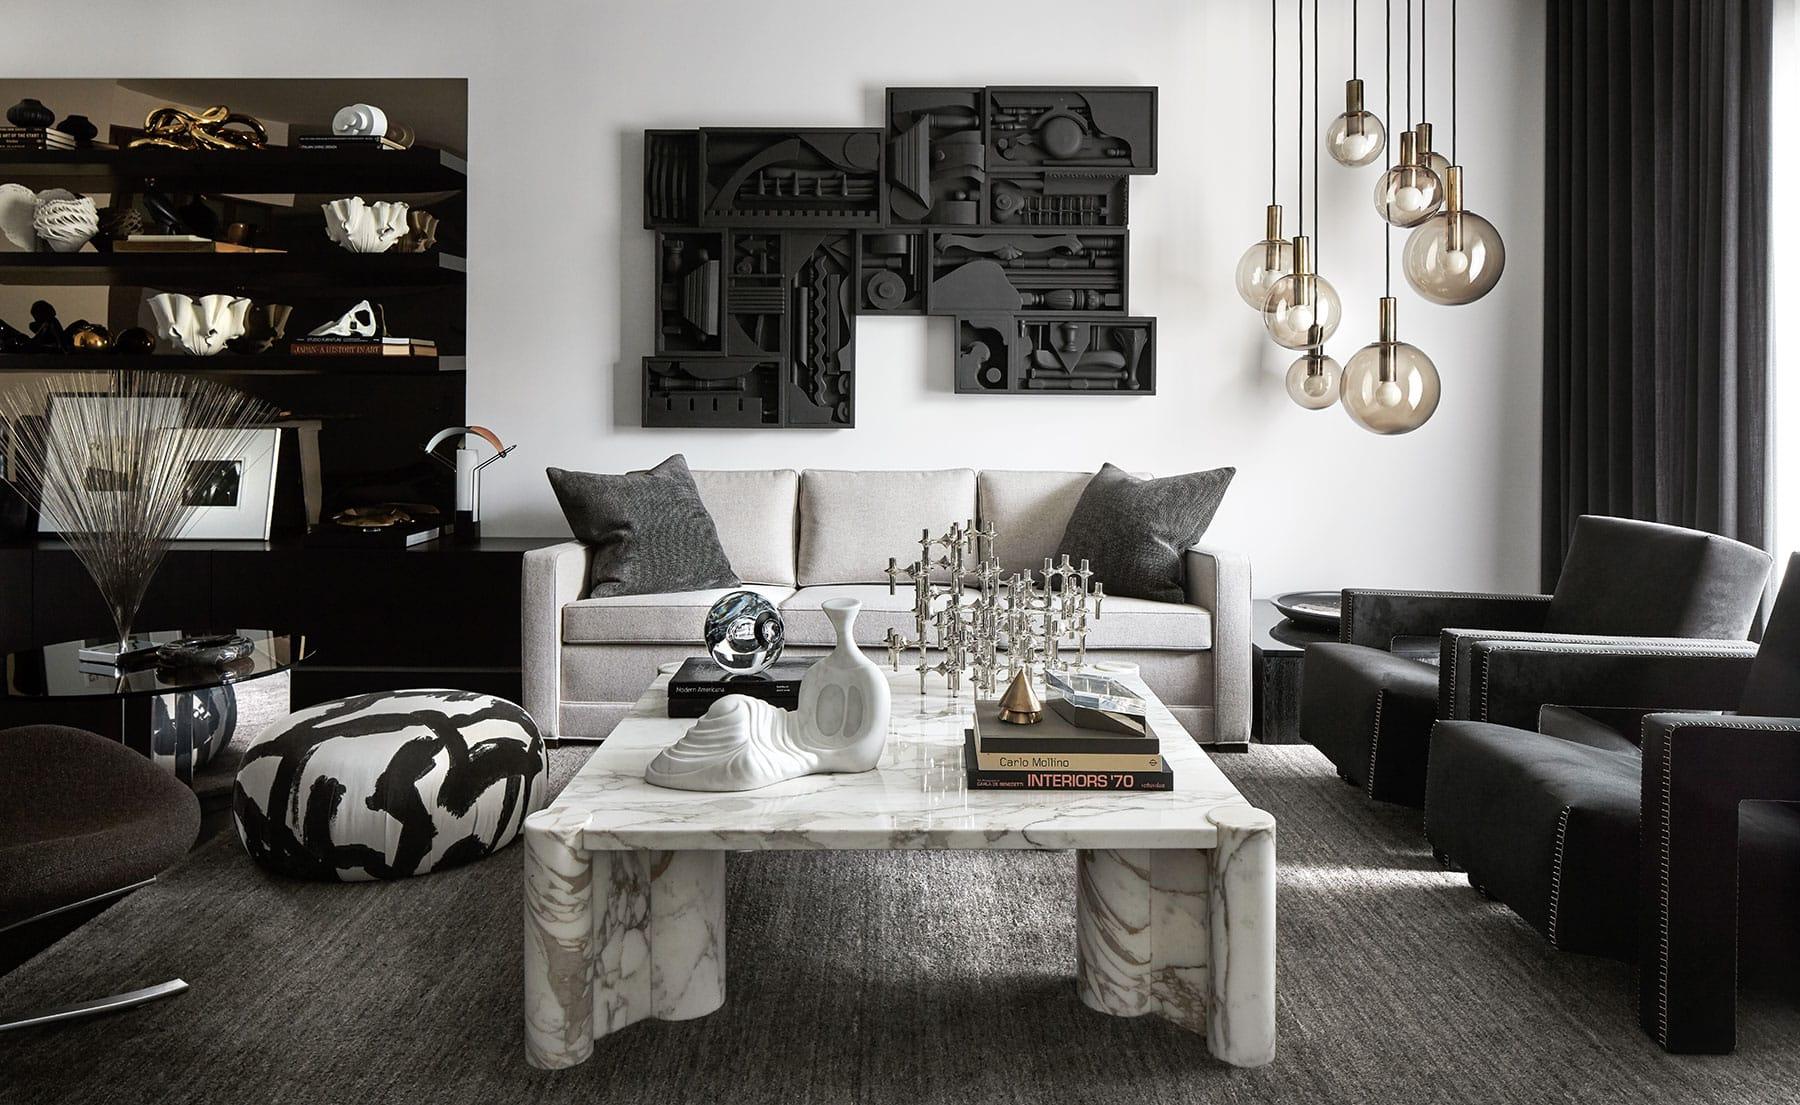 Vern + Vera's Sean Cowan and Eric Silverstrim living room